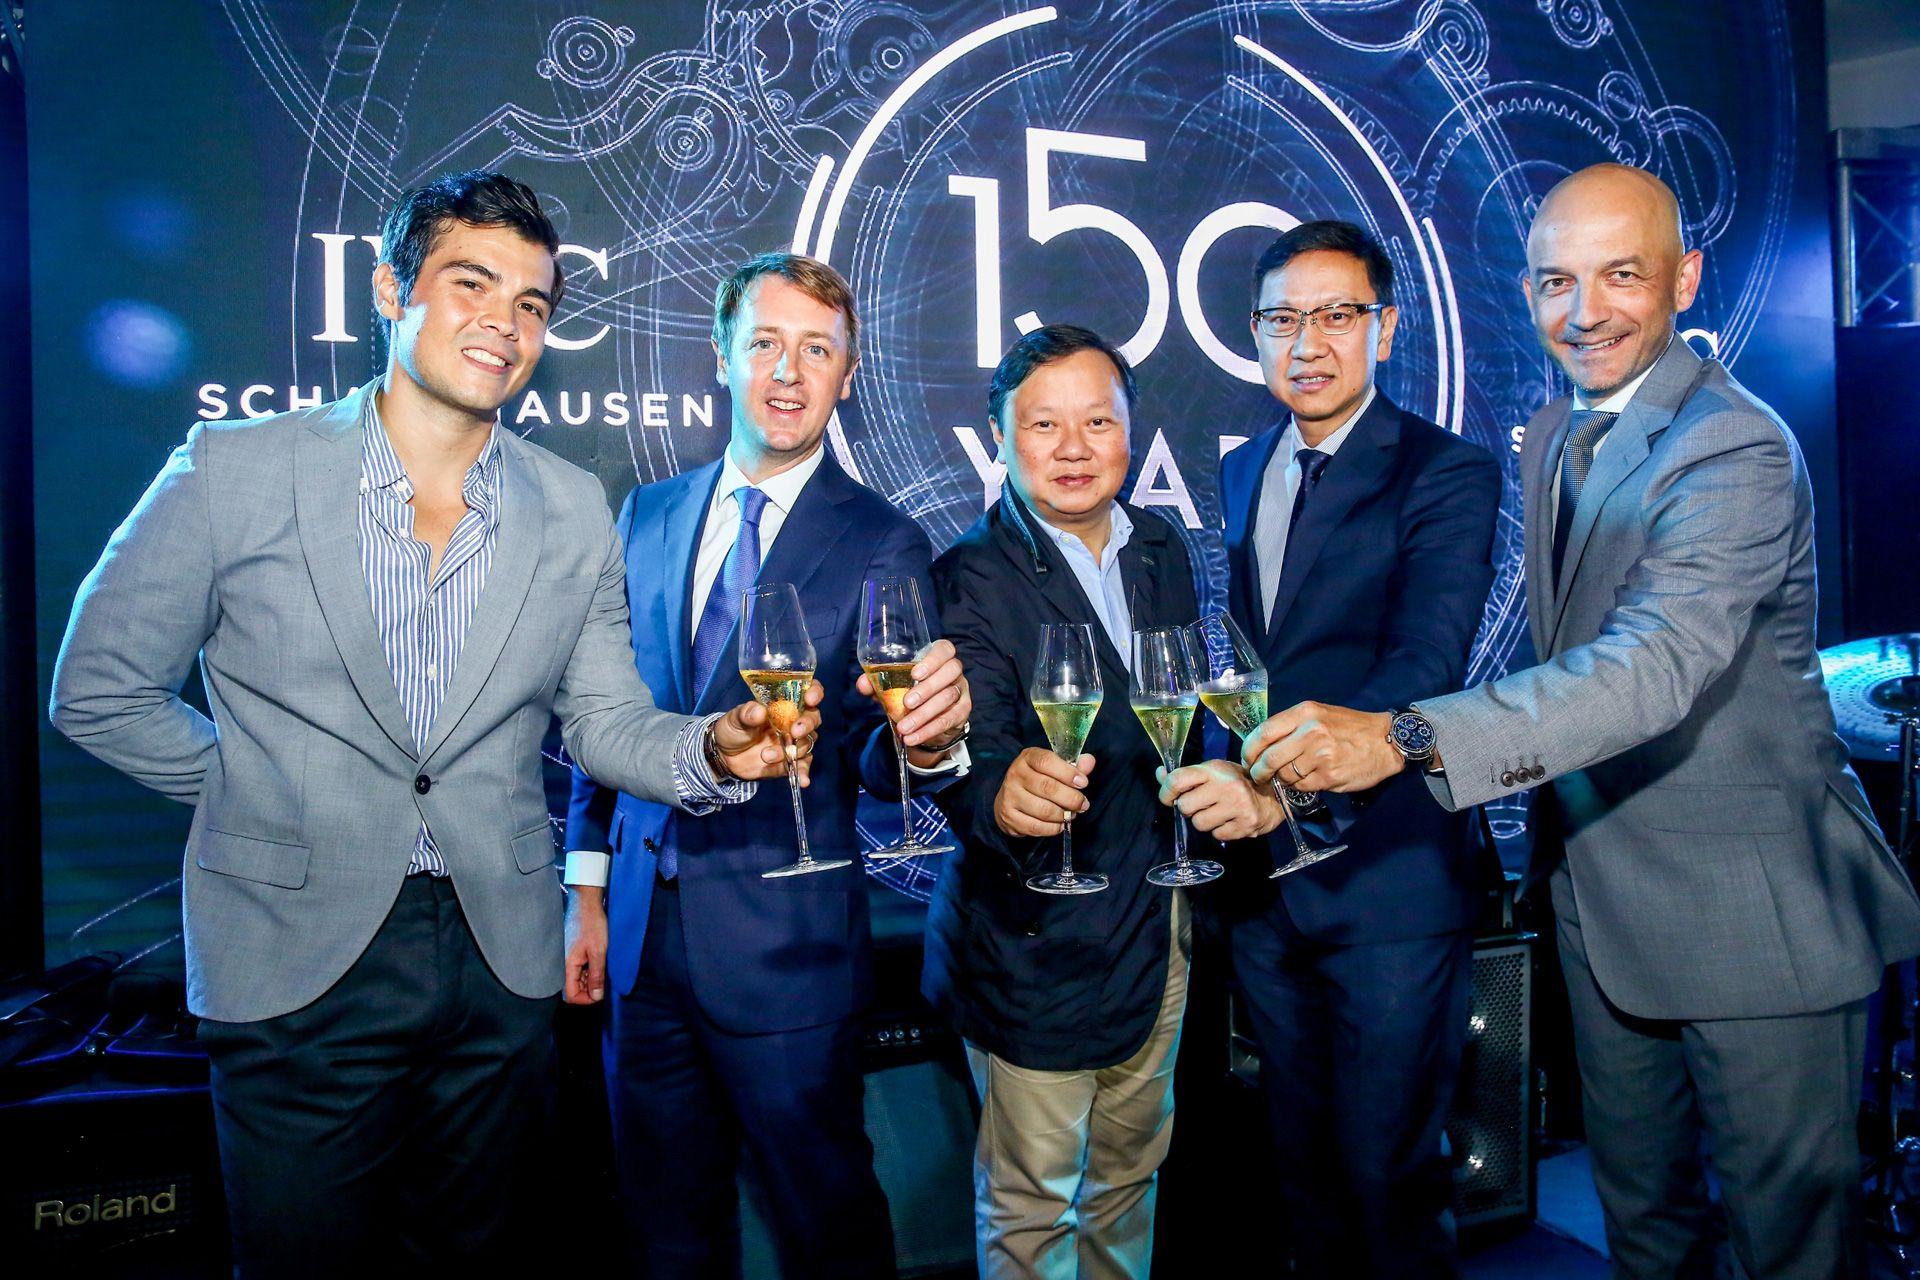 Erwan Heussaff, Stanislas Rambaud, Ivan and Emerson Yao, and Marc Michel-Amadry